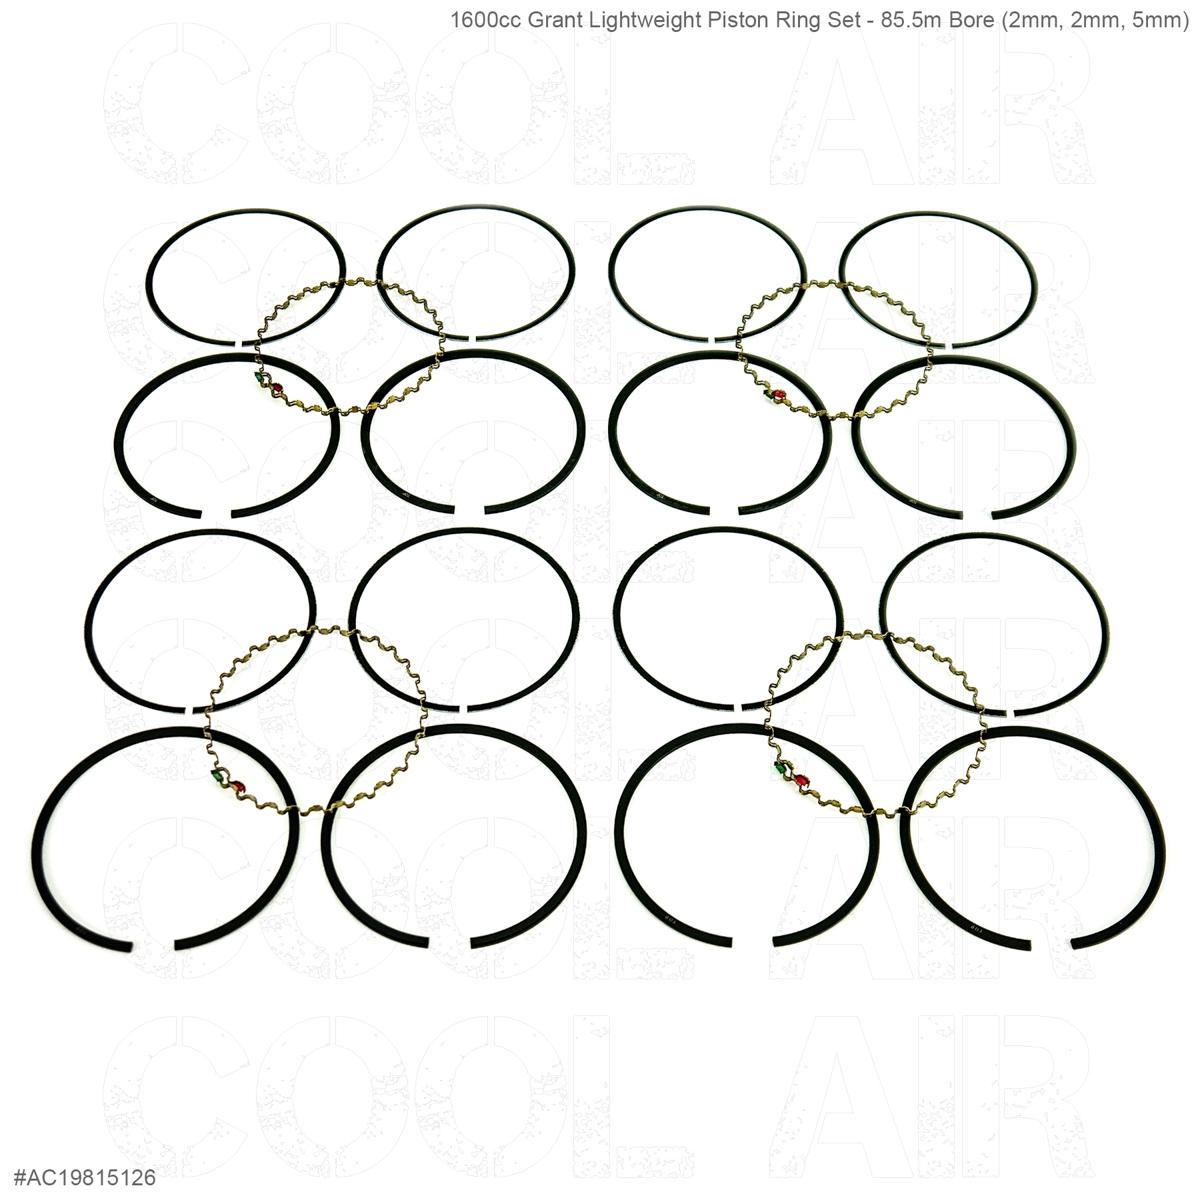 1600cc Grant Lightweight Piston Ring Set - 85.5mm Bore (2mm, 2mm, 5mm)